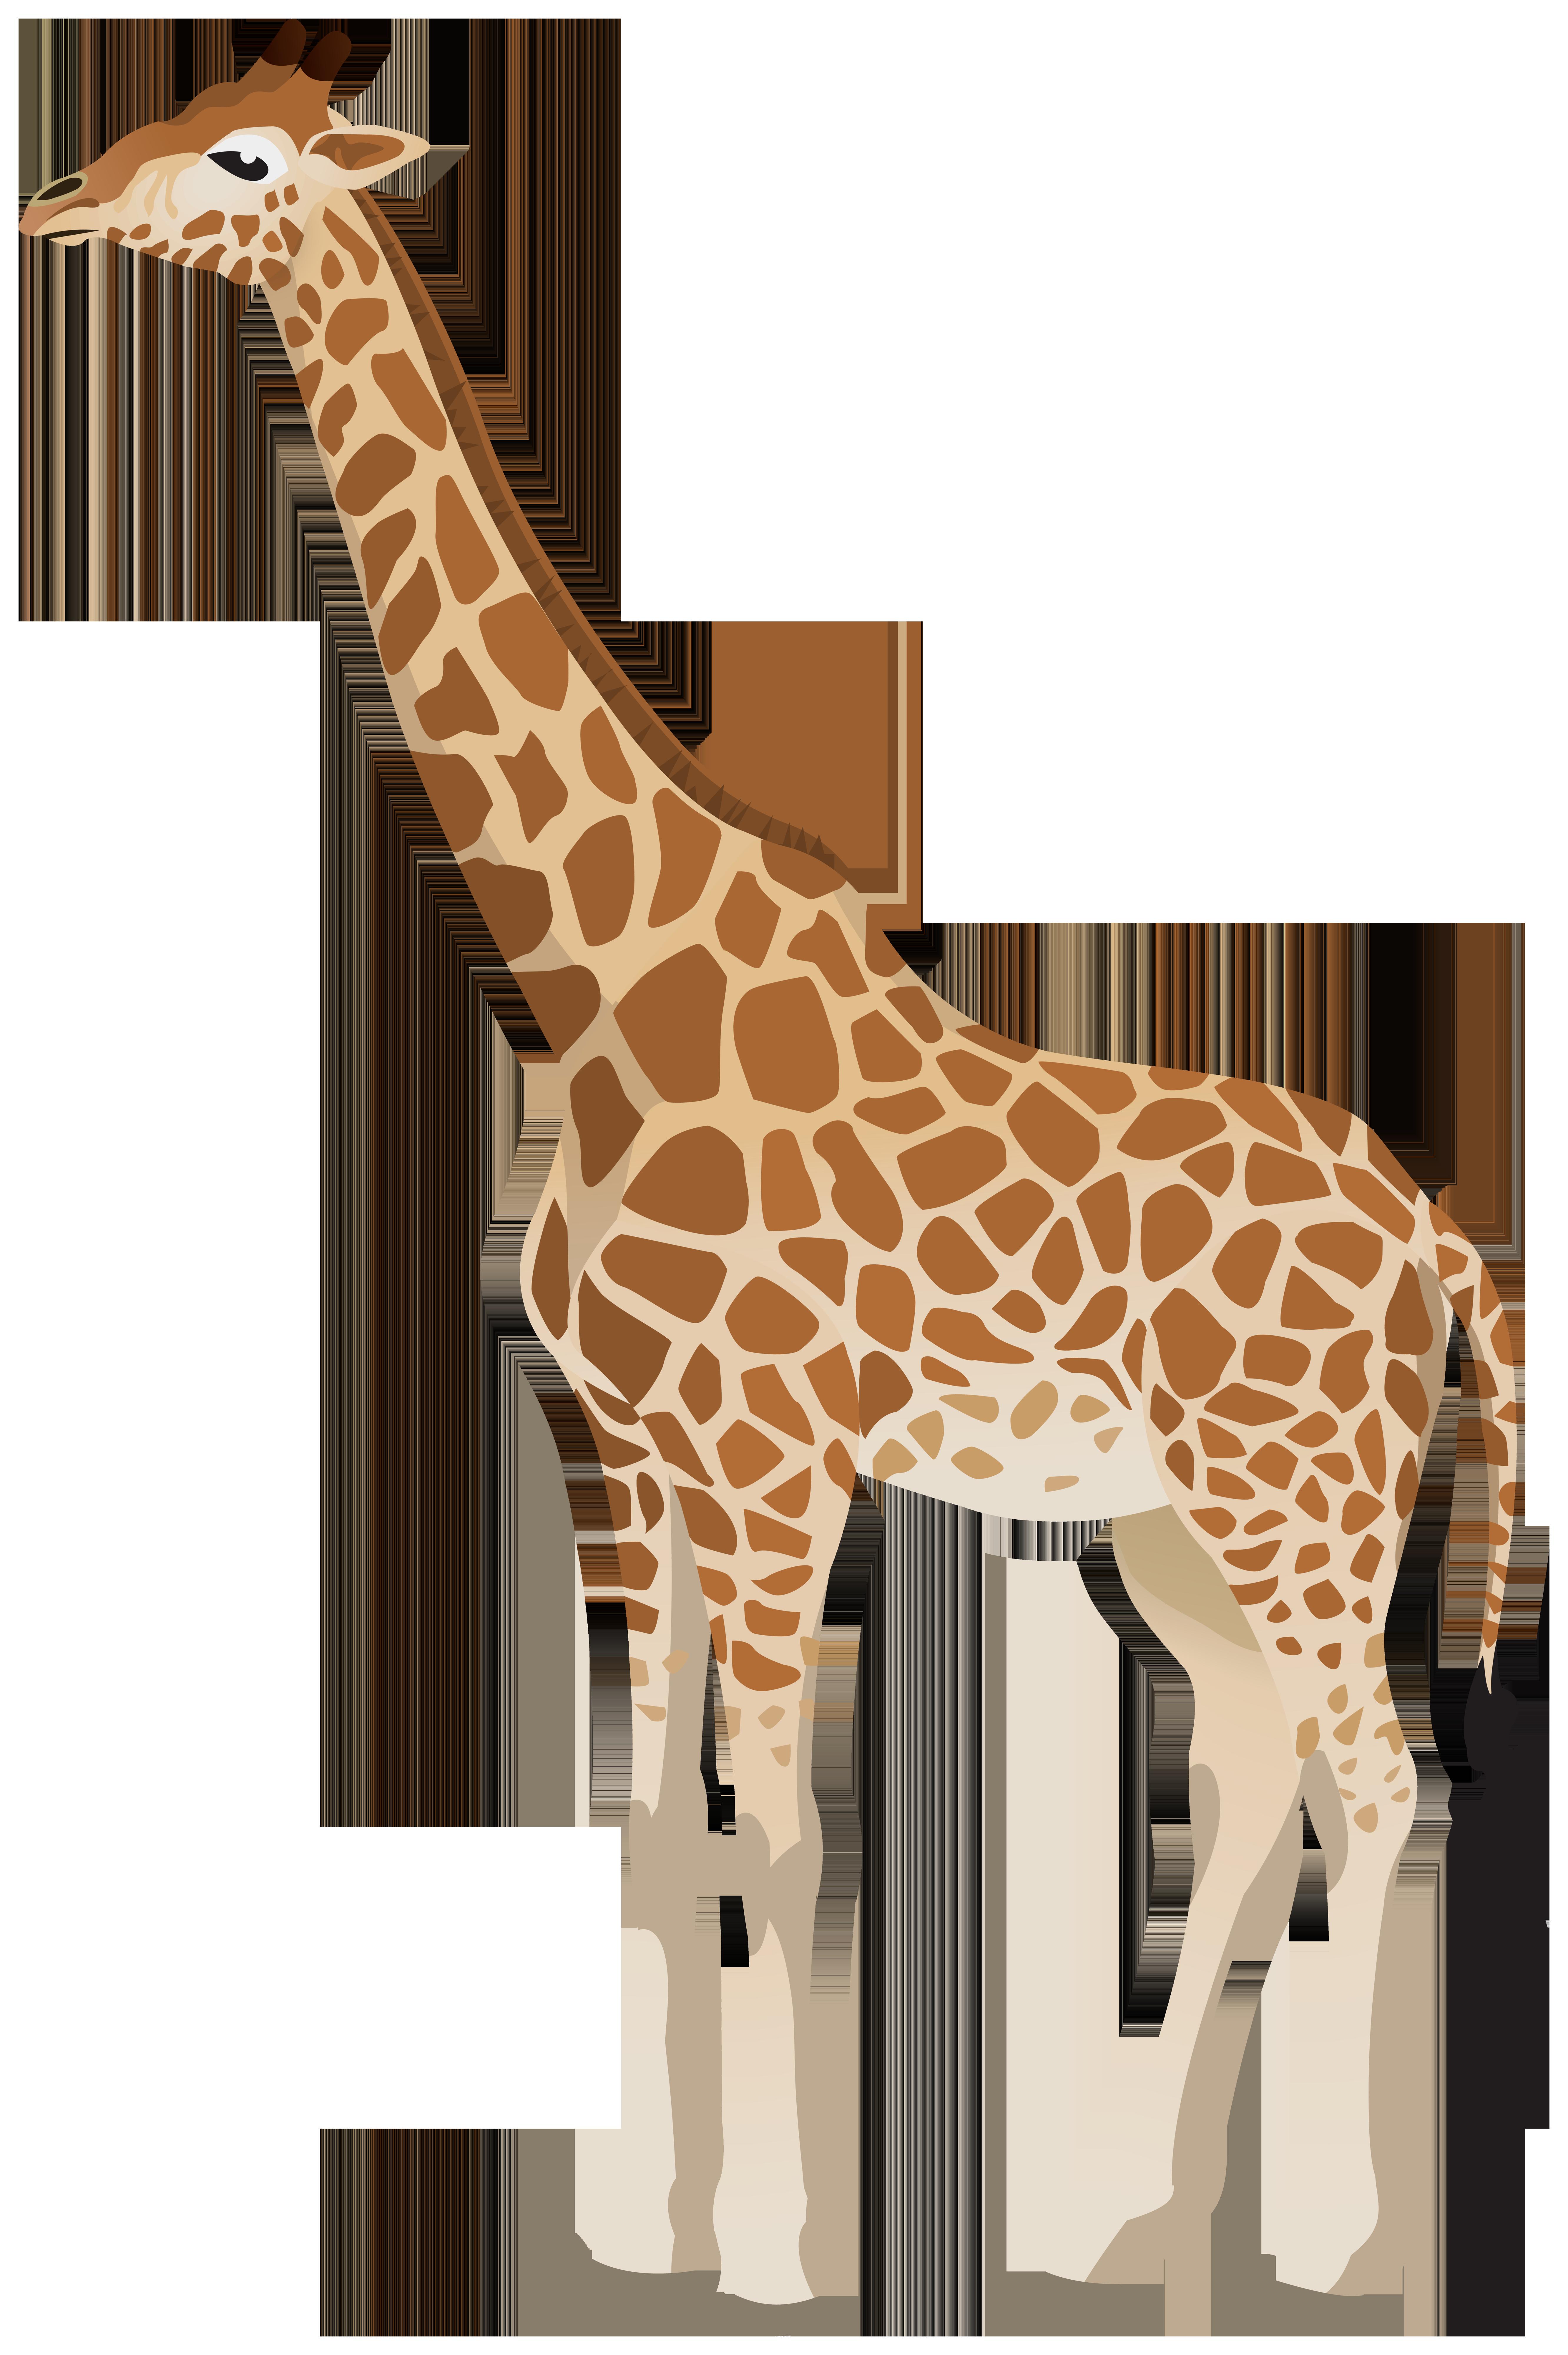 Giraffe Clipart Image